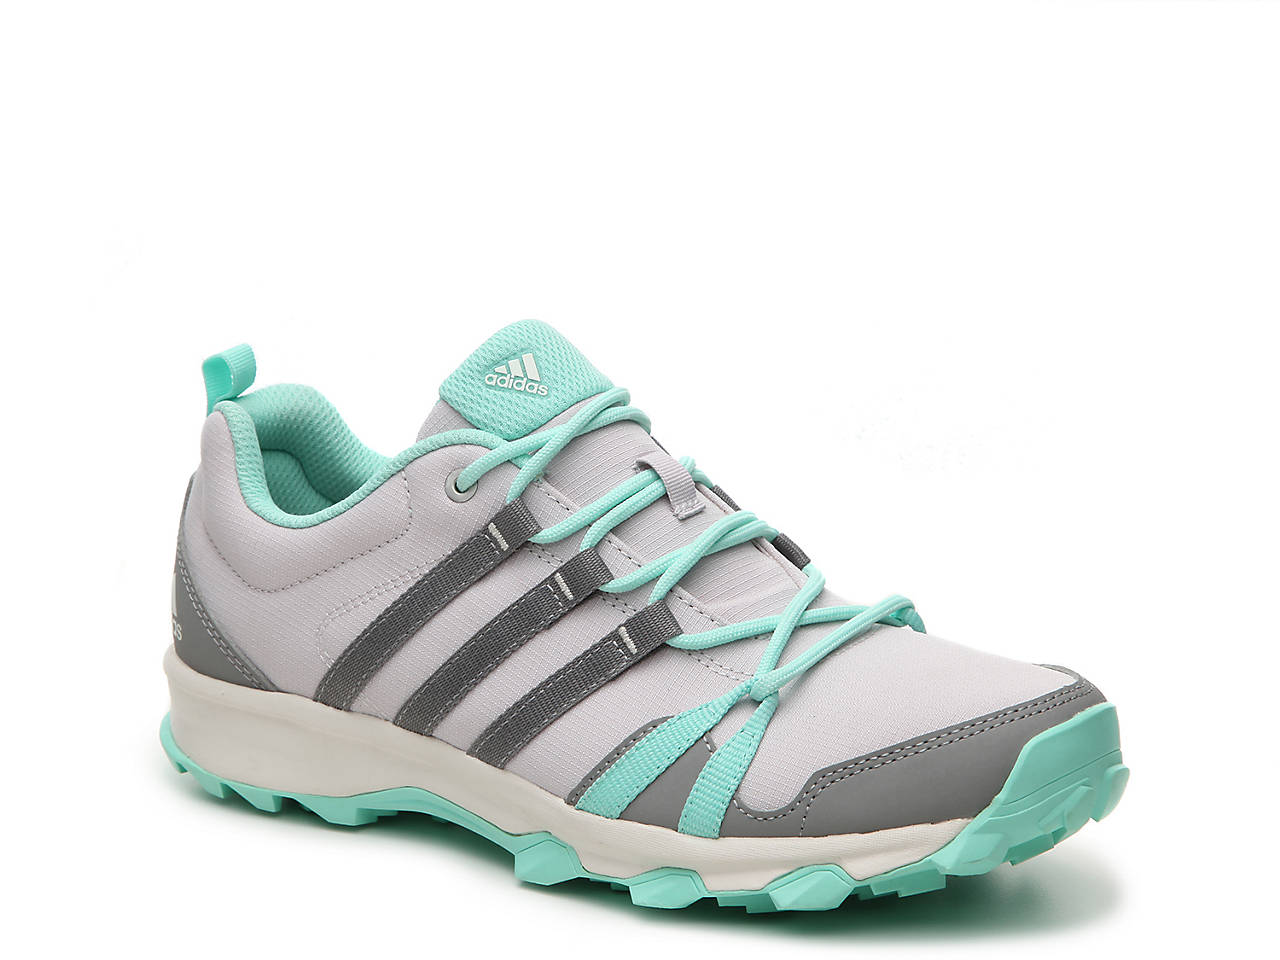 a8e5a7aebdebd adidas Tracerocker Sneaker - Women s Women s Shoes